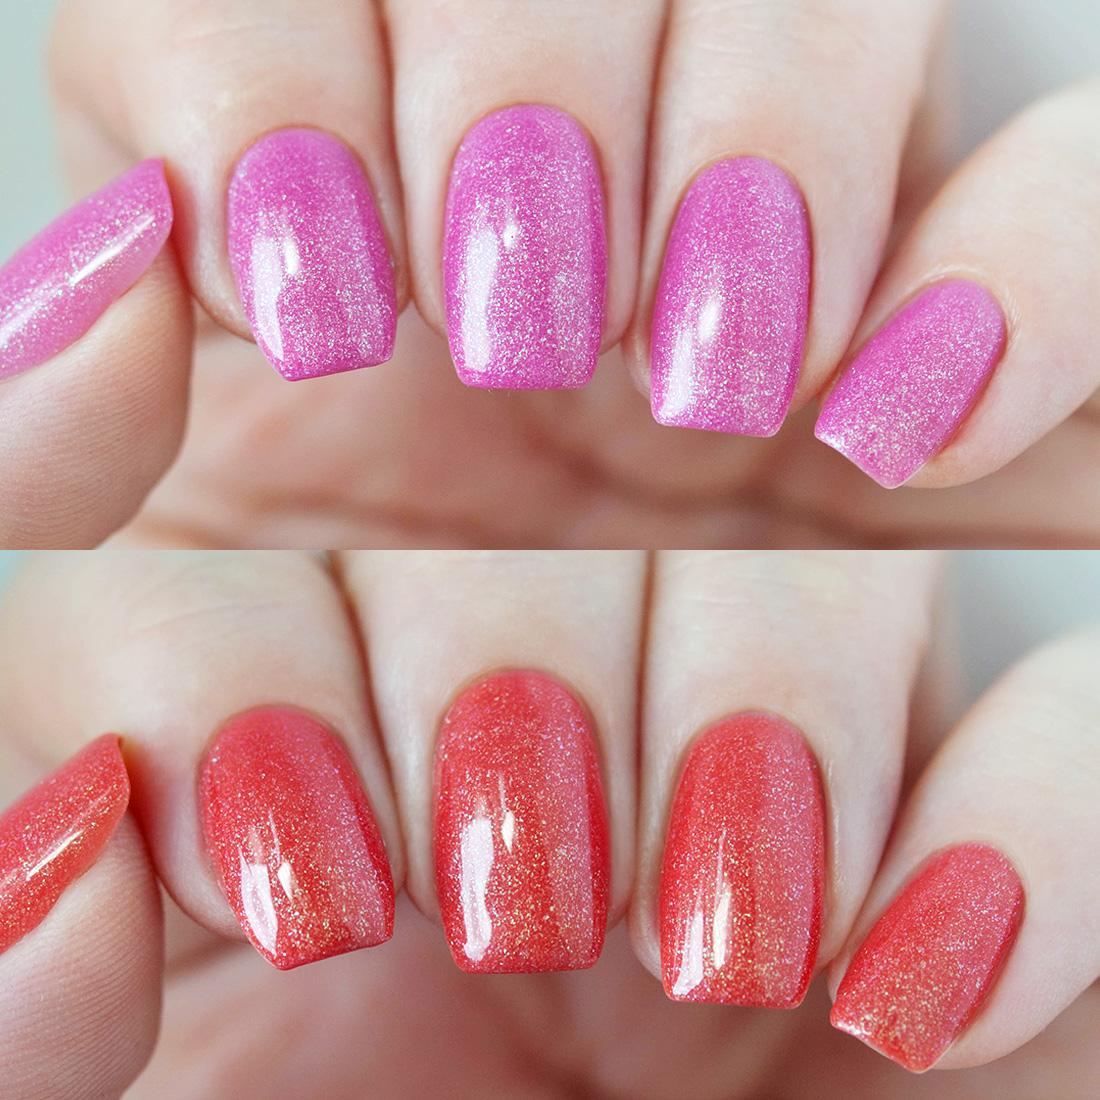 BMC Thermal Effect Color Changing Nail Lacquer Gel Polish - Sedona ...